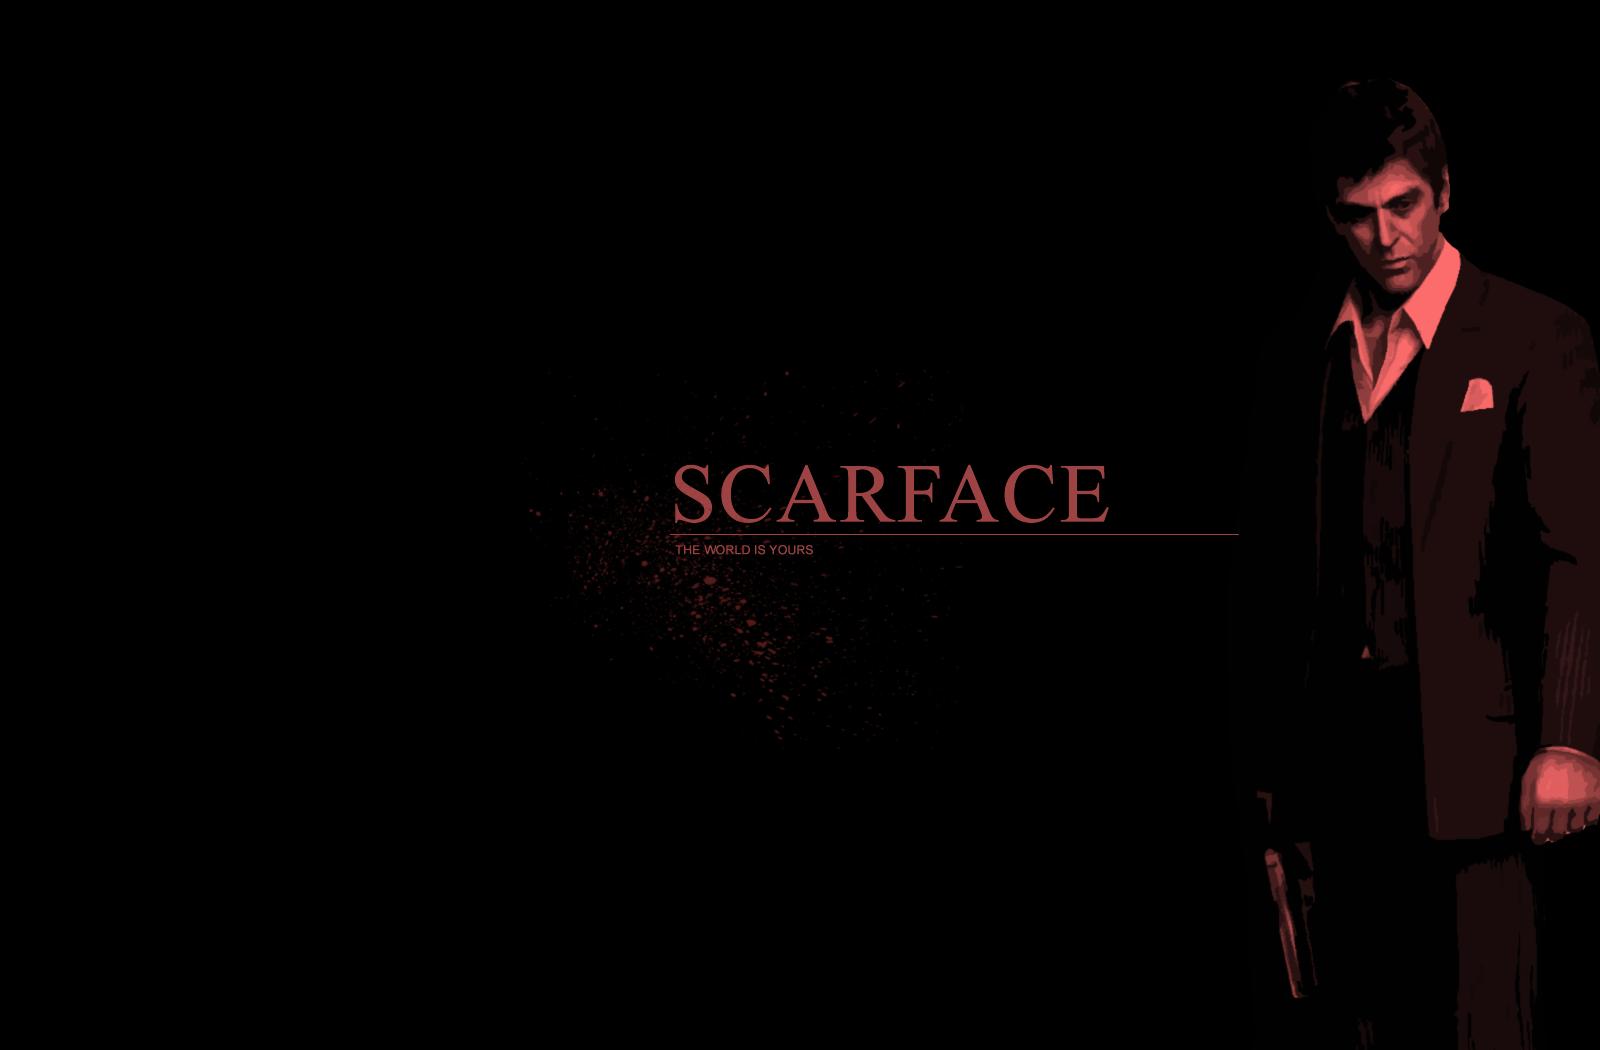 74 Scarface Wallpaper Hd On Wallpapersafari